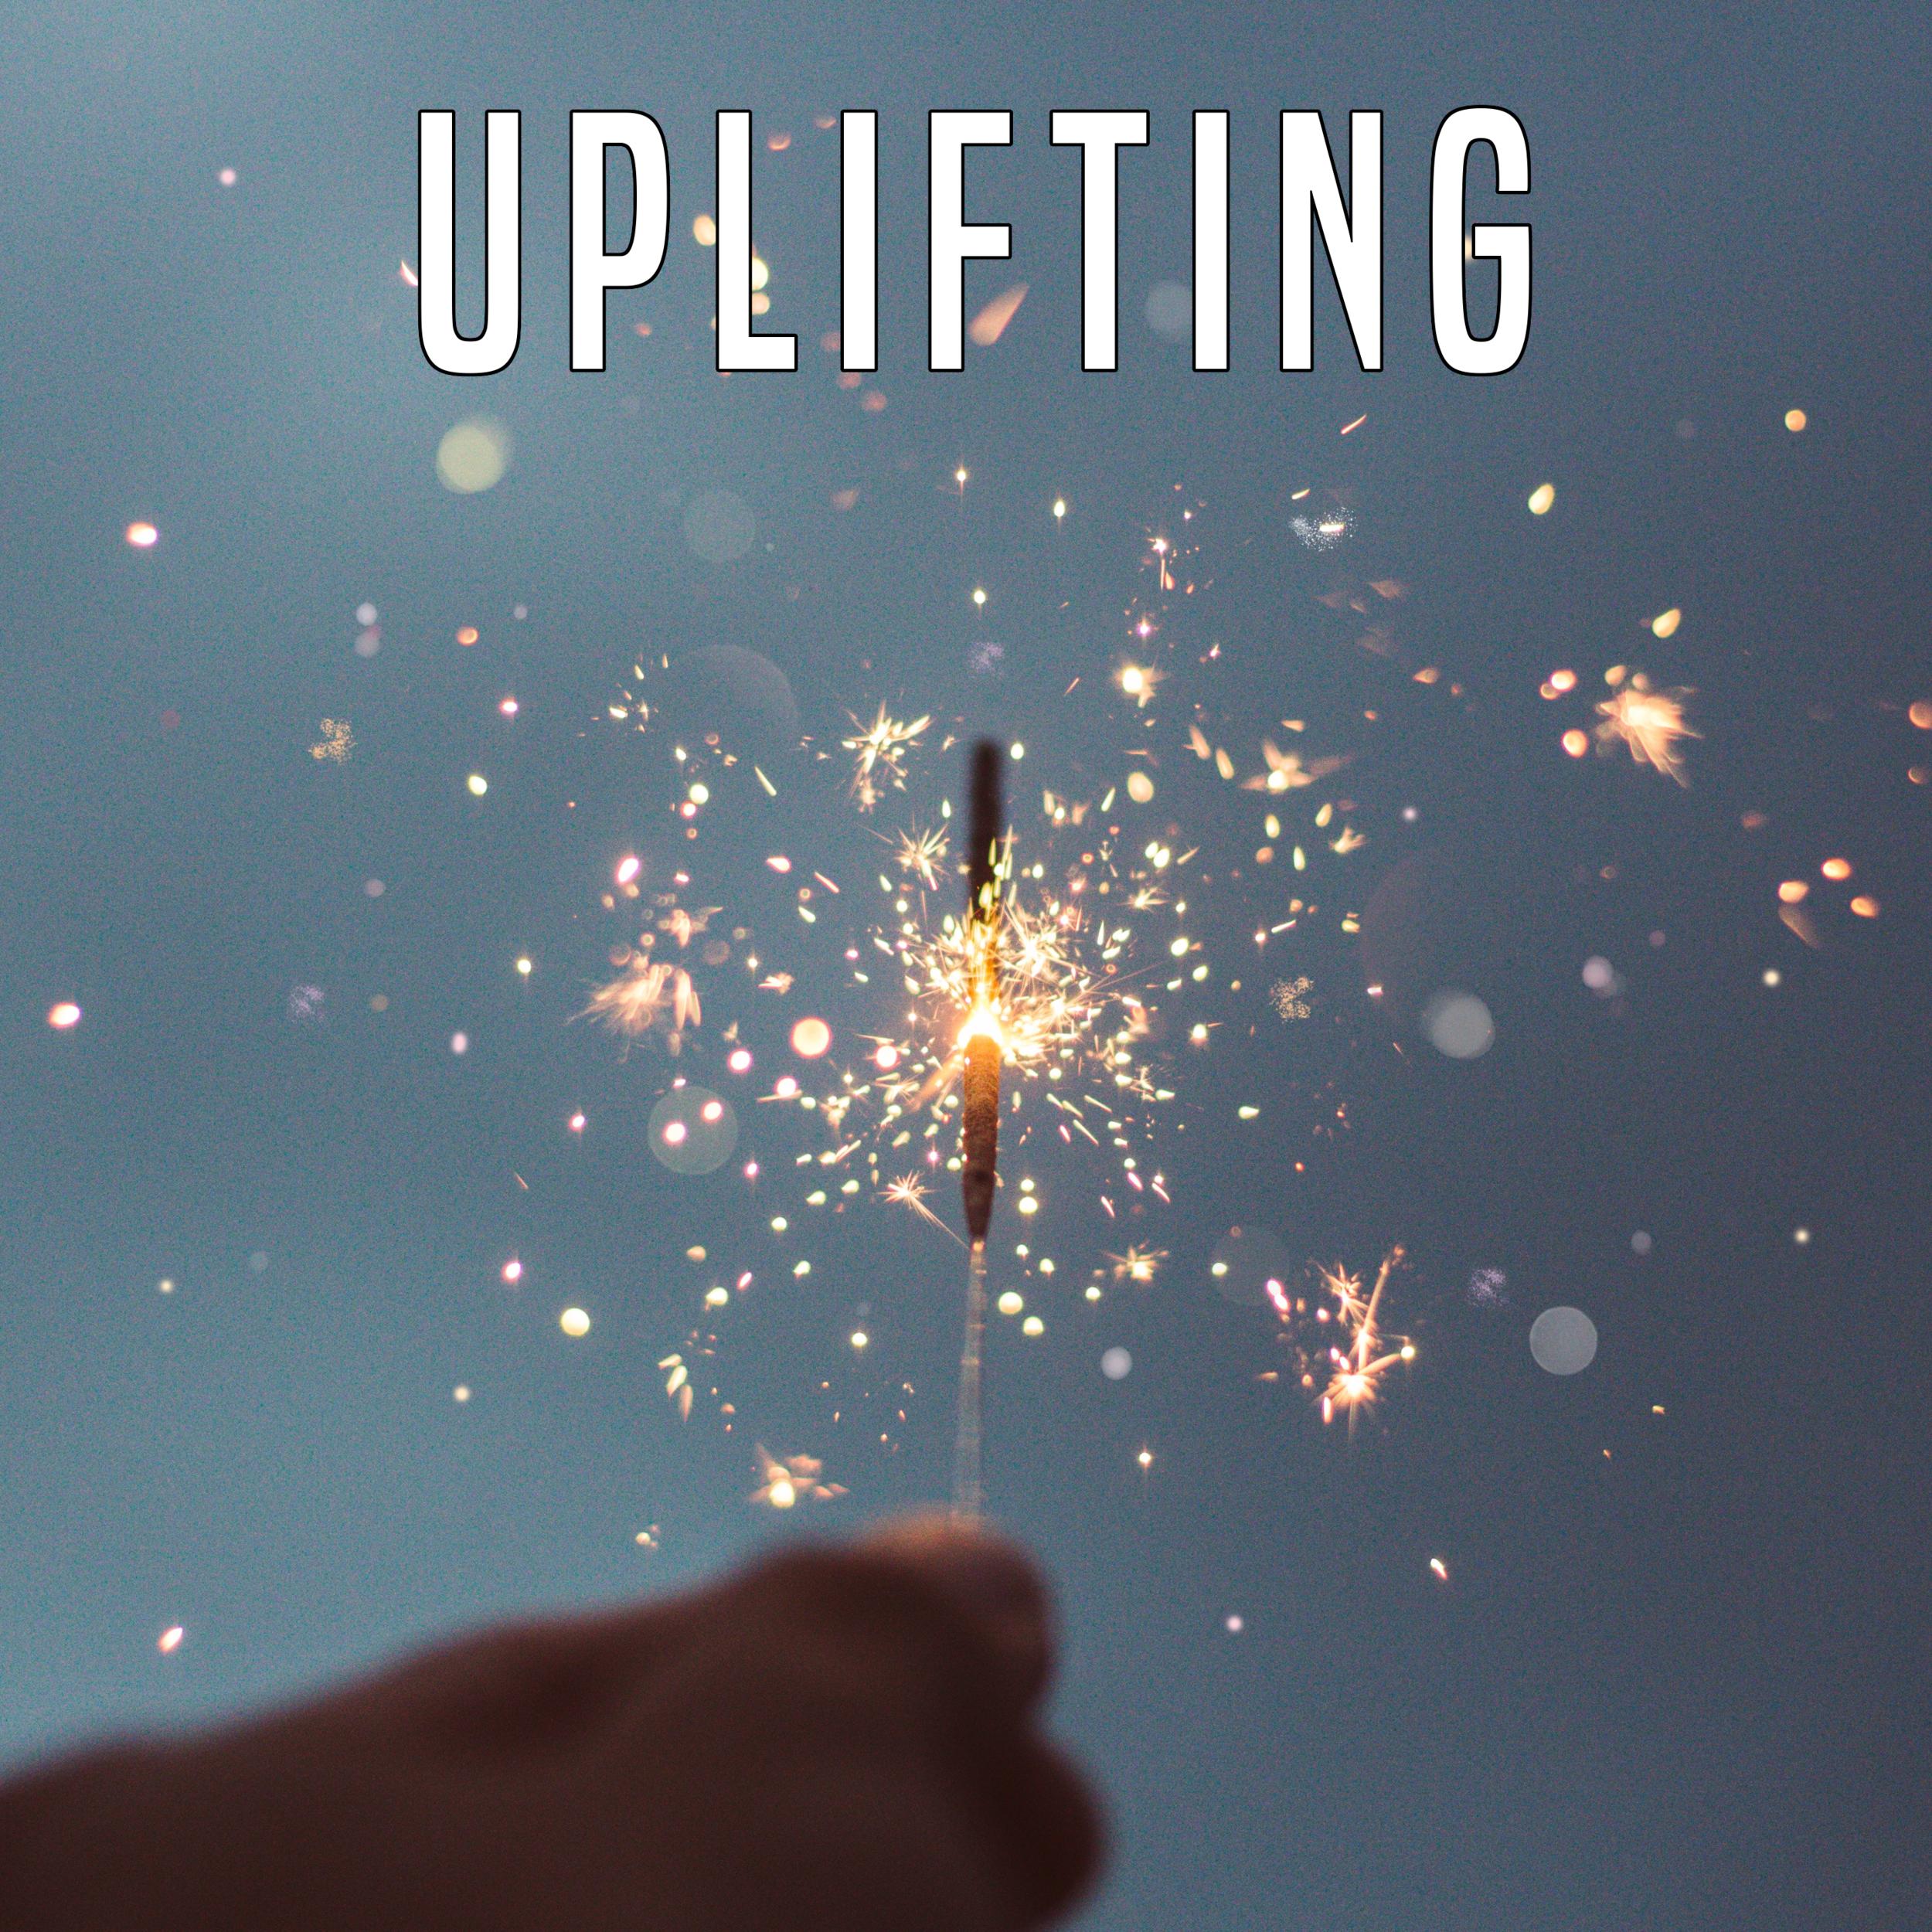 Uplifting.png